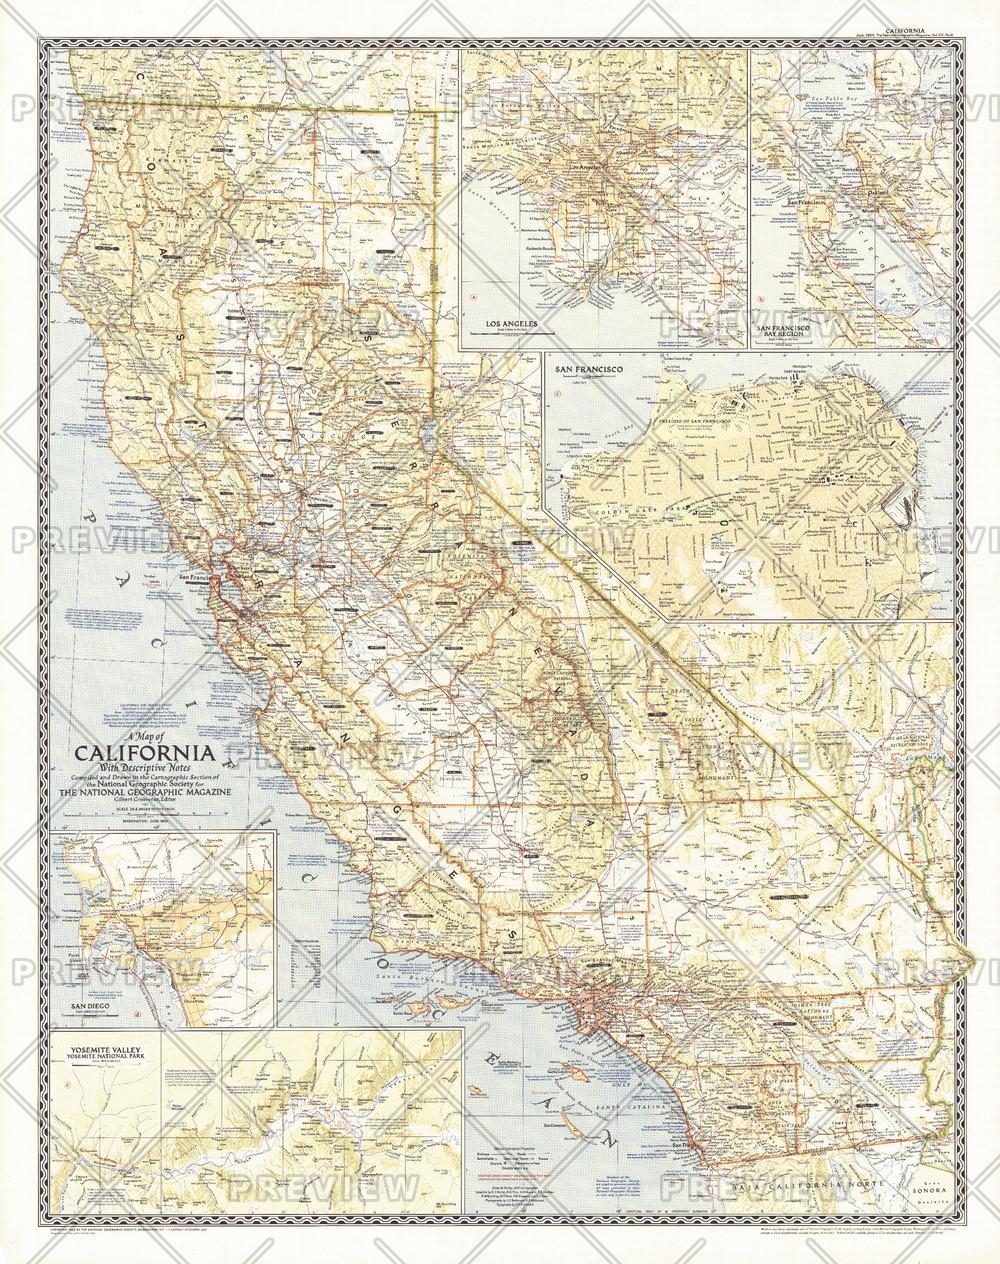 California - Published 1954